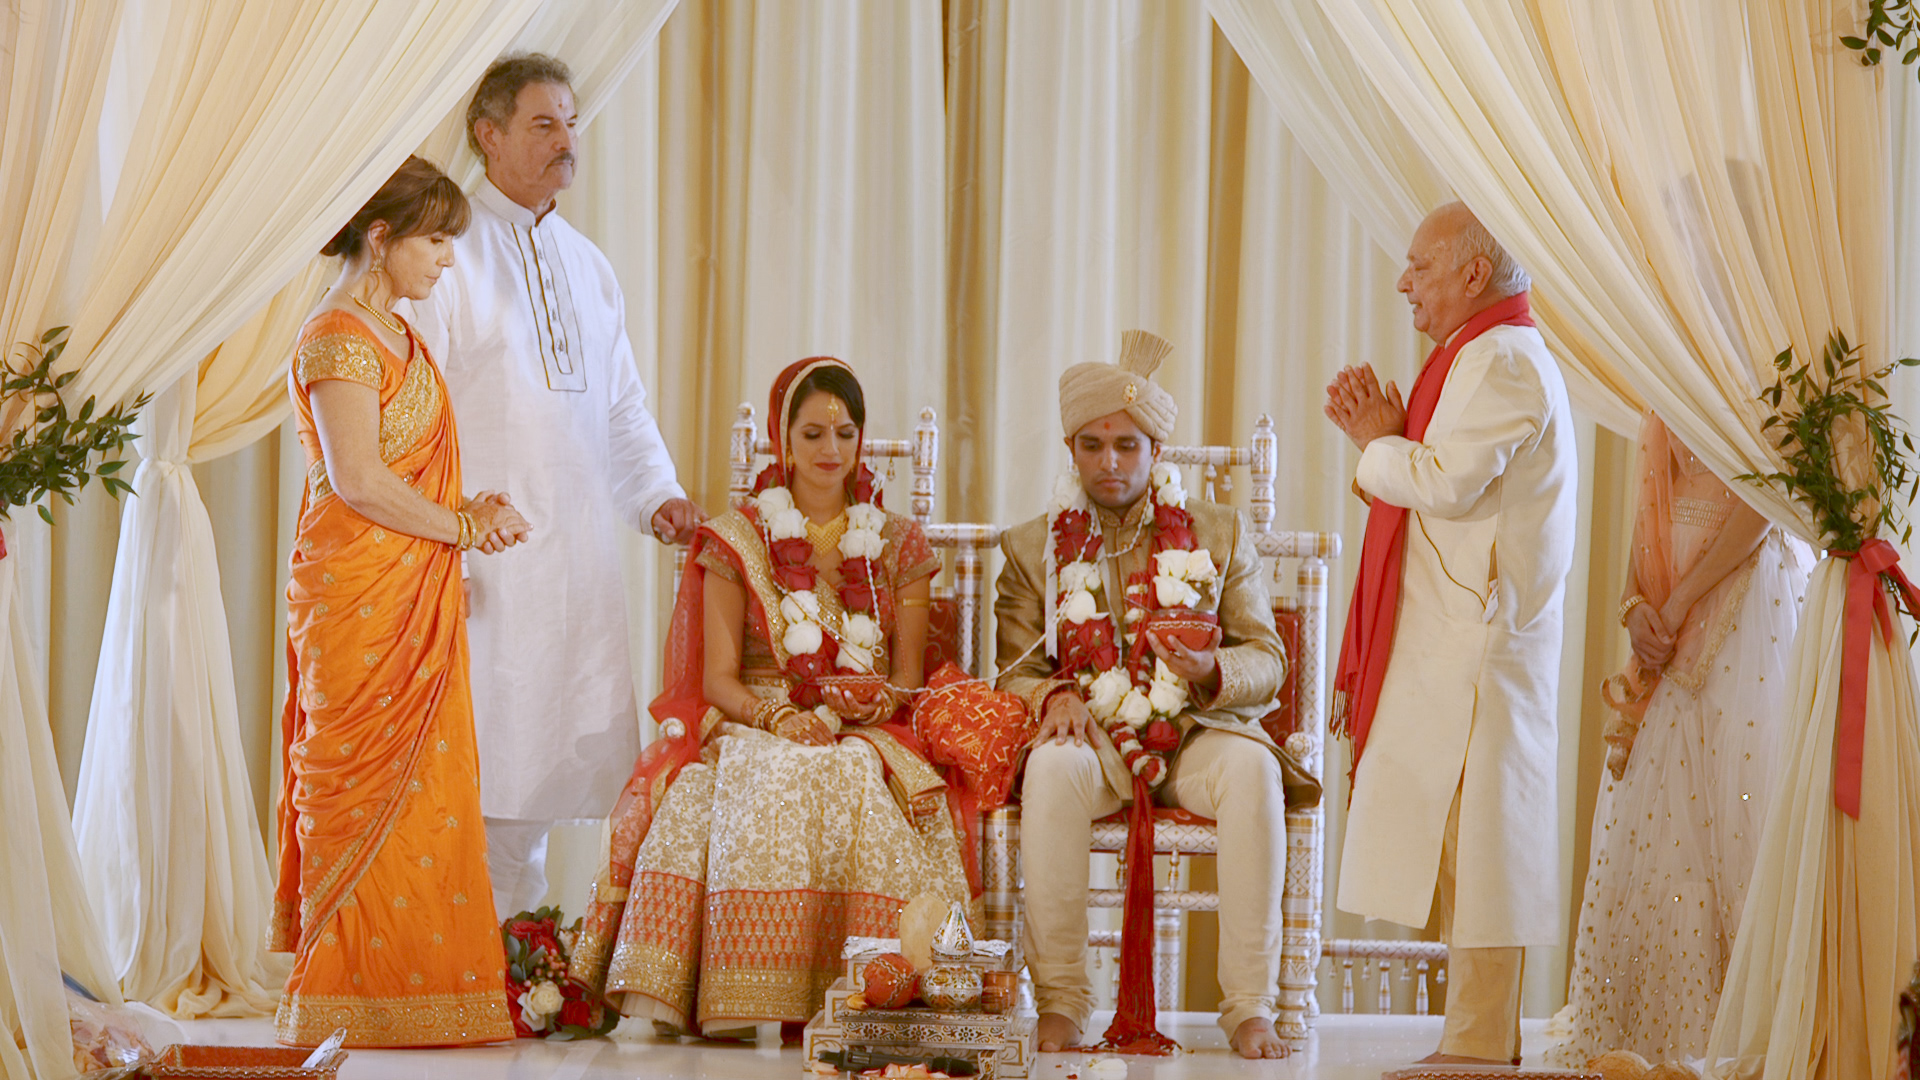 indian-wedding-ceremony-los-angeles.jpg